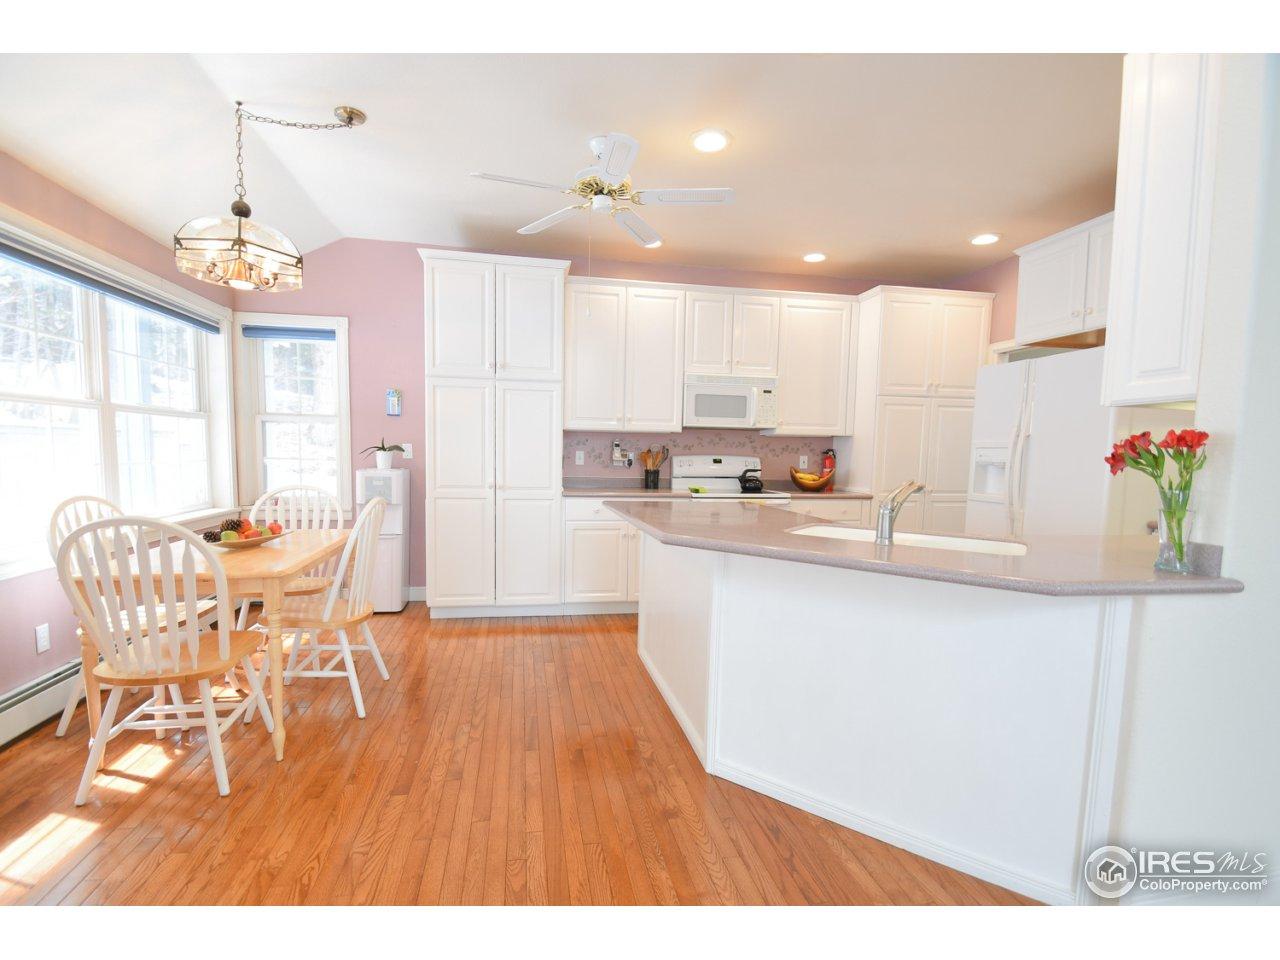 Jamestown Real Estate & Search Properties in Jamestown) Colorado